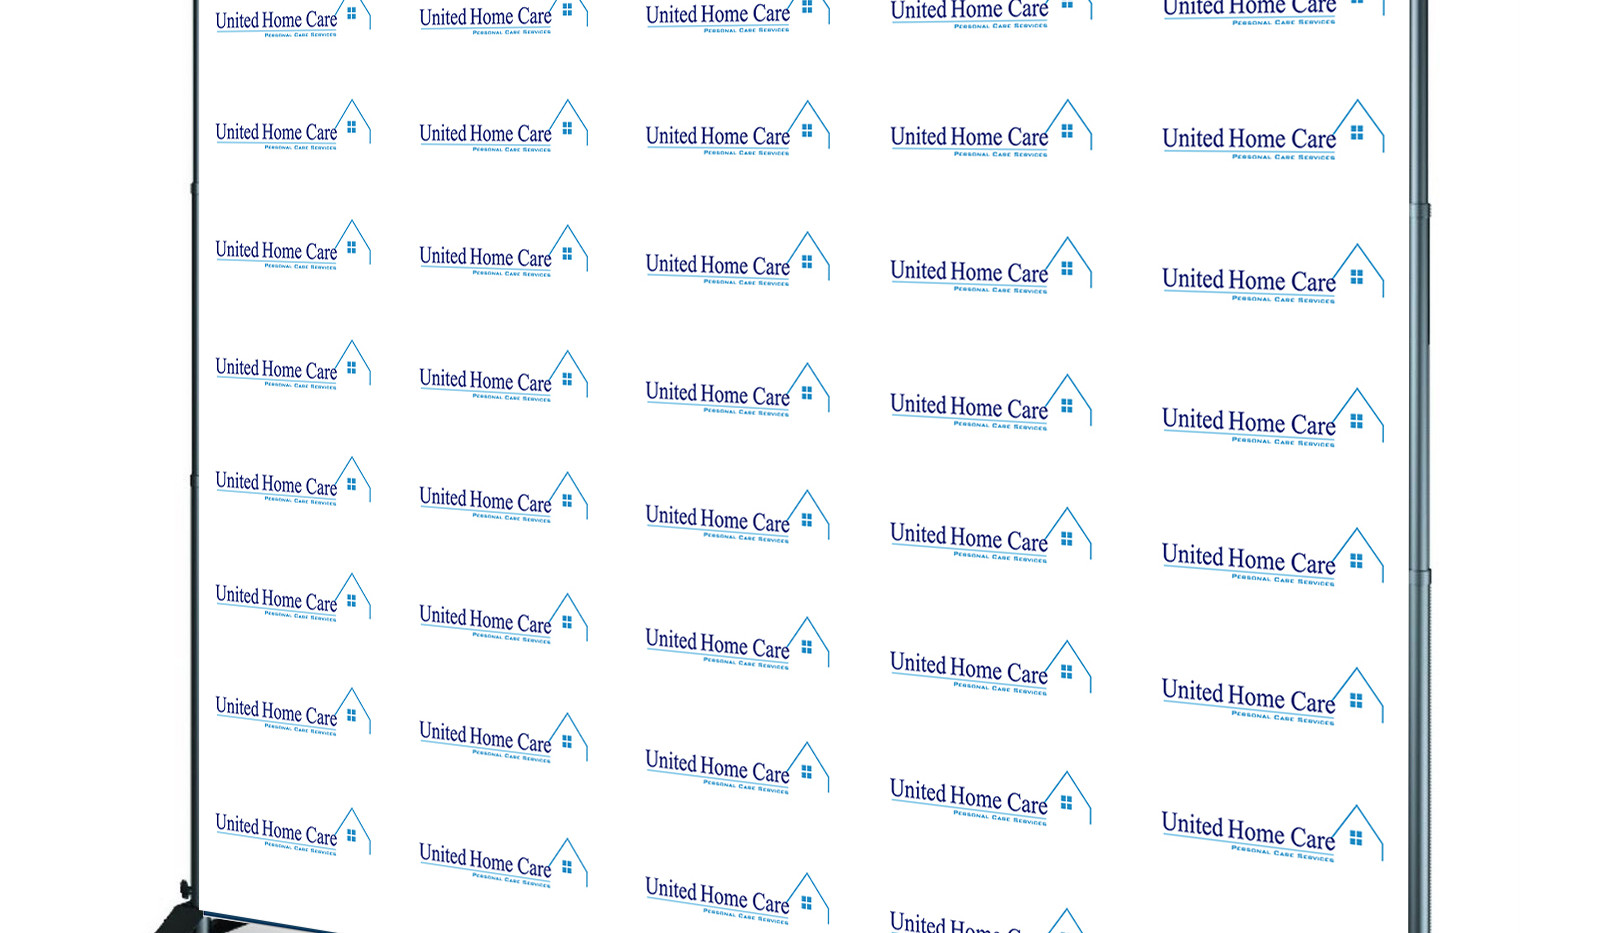 United Home Care Backdrop Mockup.jpg